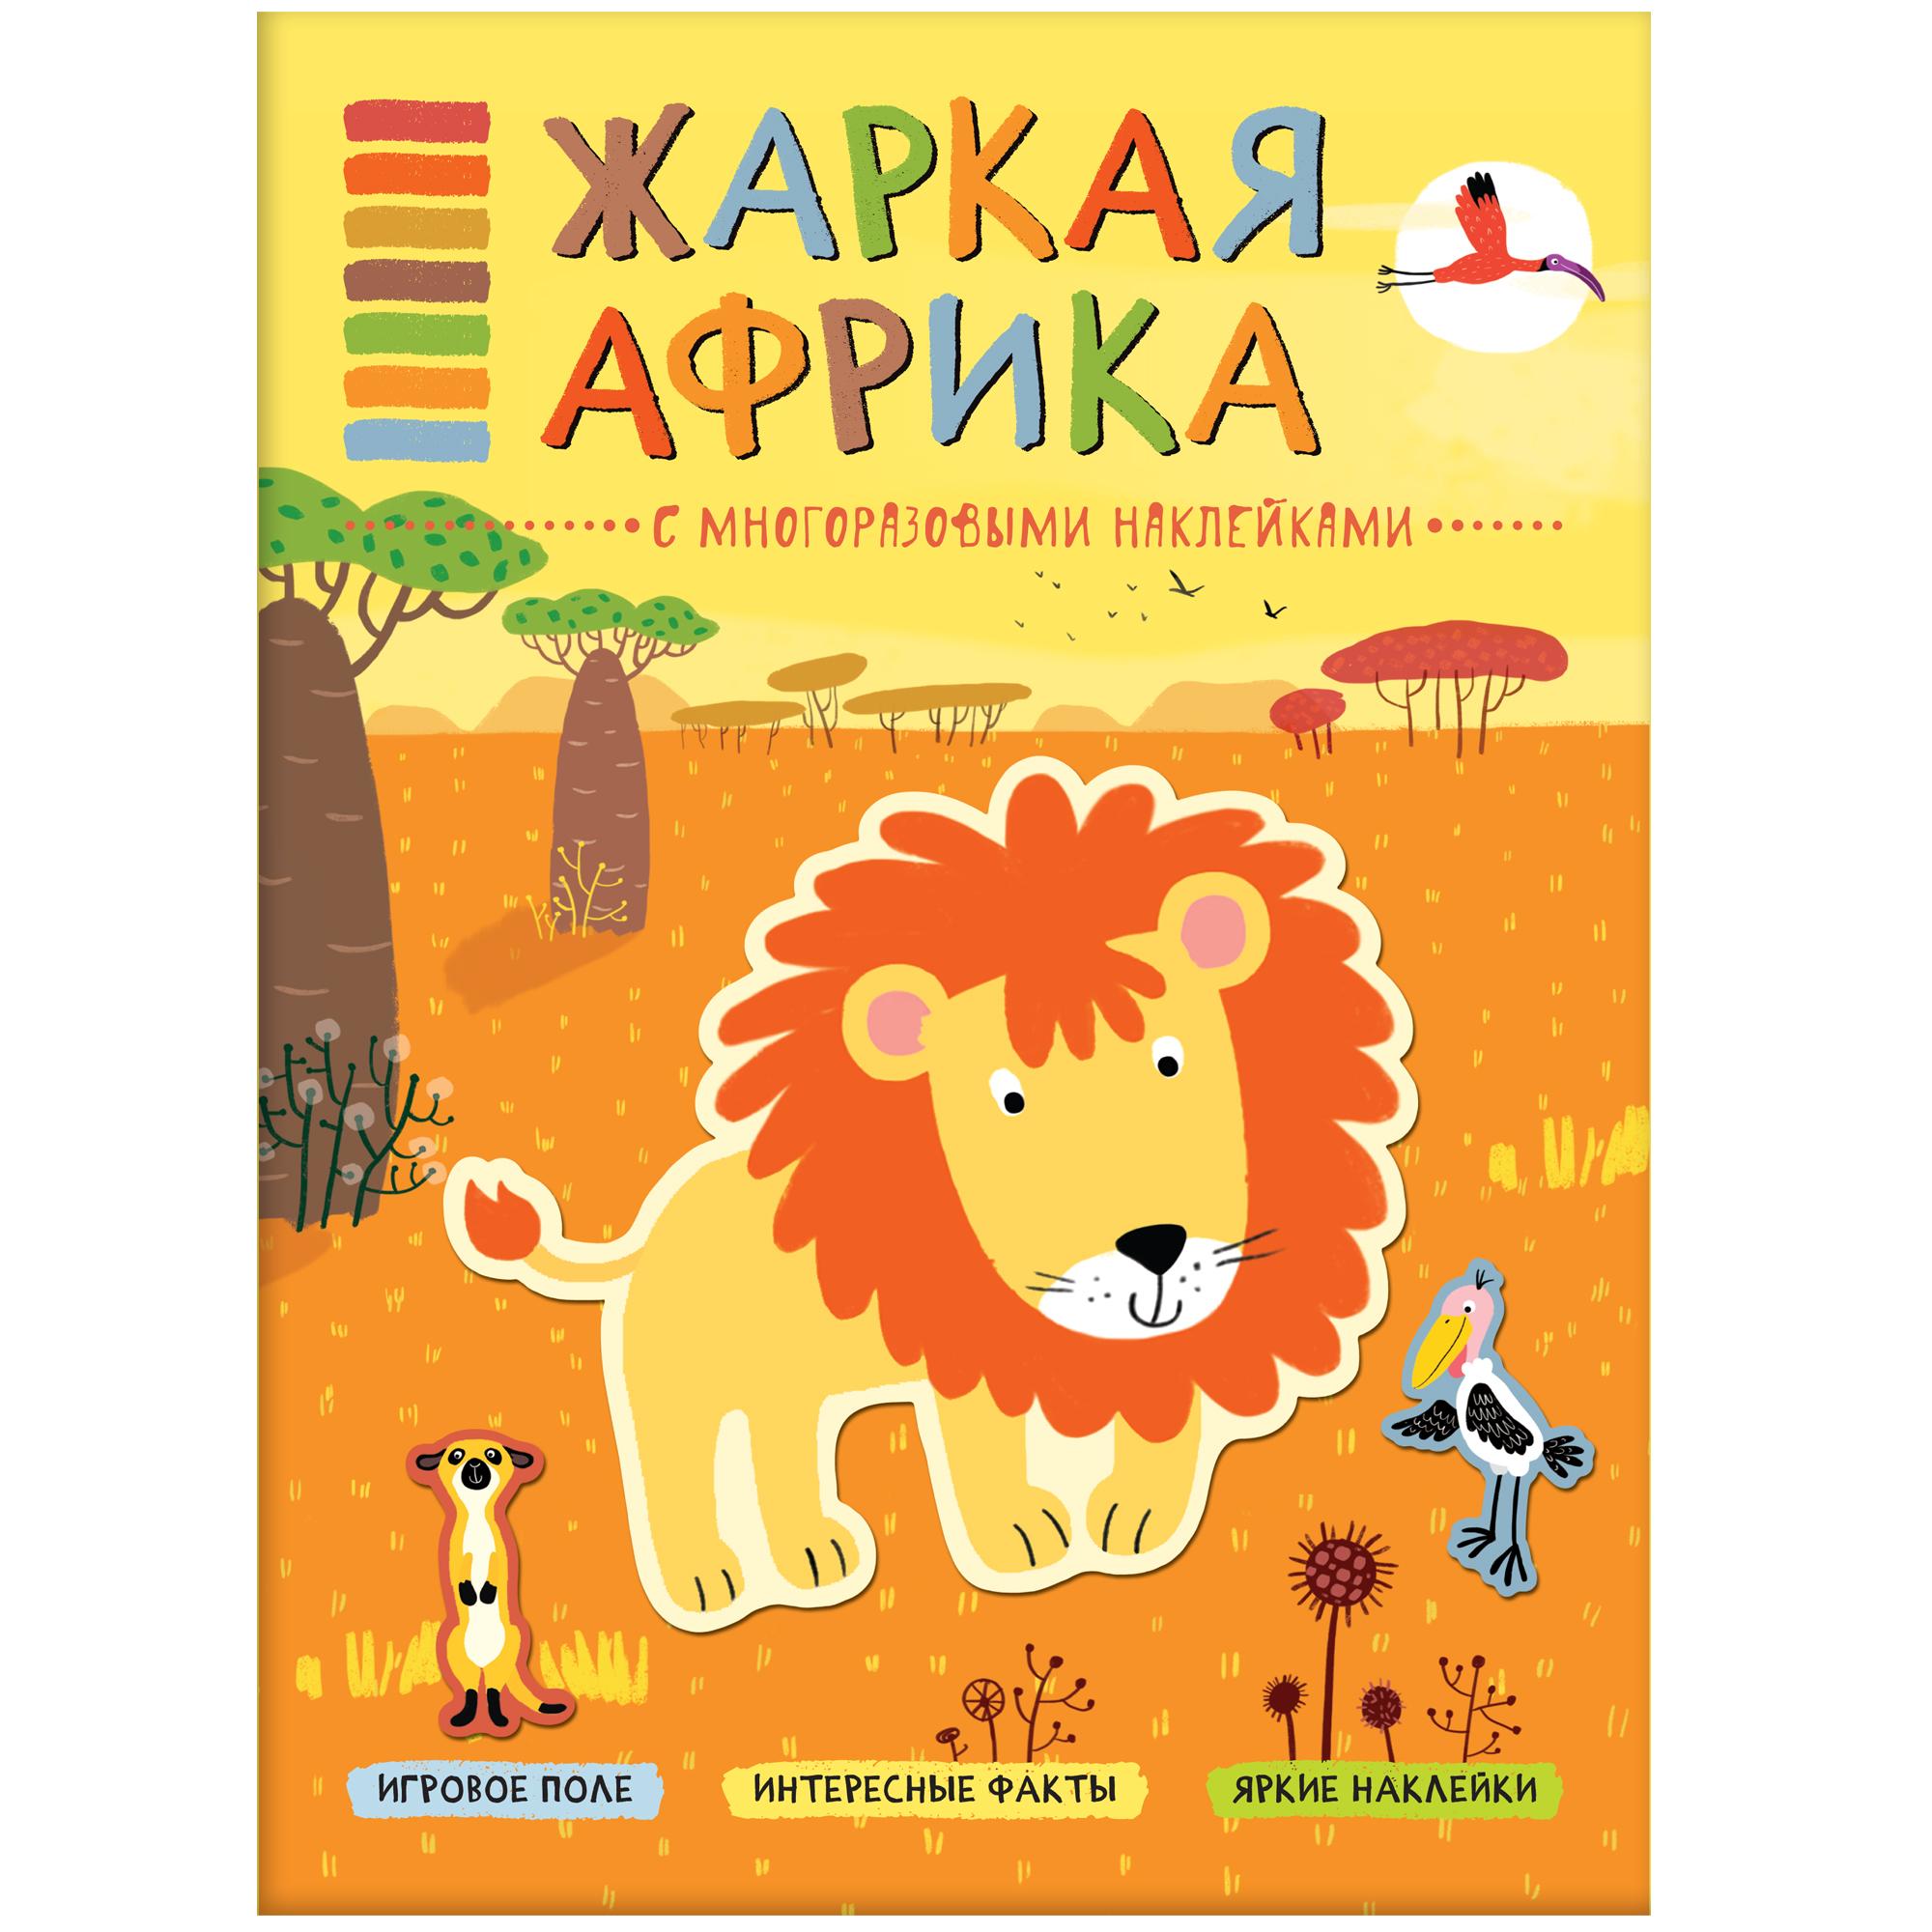 Книга Мозаика-Синтез Мозаика-Синтез «В мире животных. Жаркая Африка» devar kids книга 12 живых животных африка и сибирь от 1 года